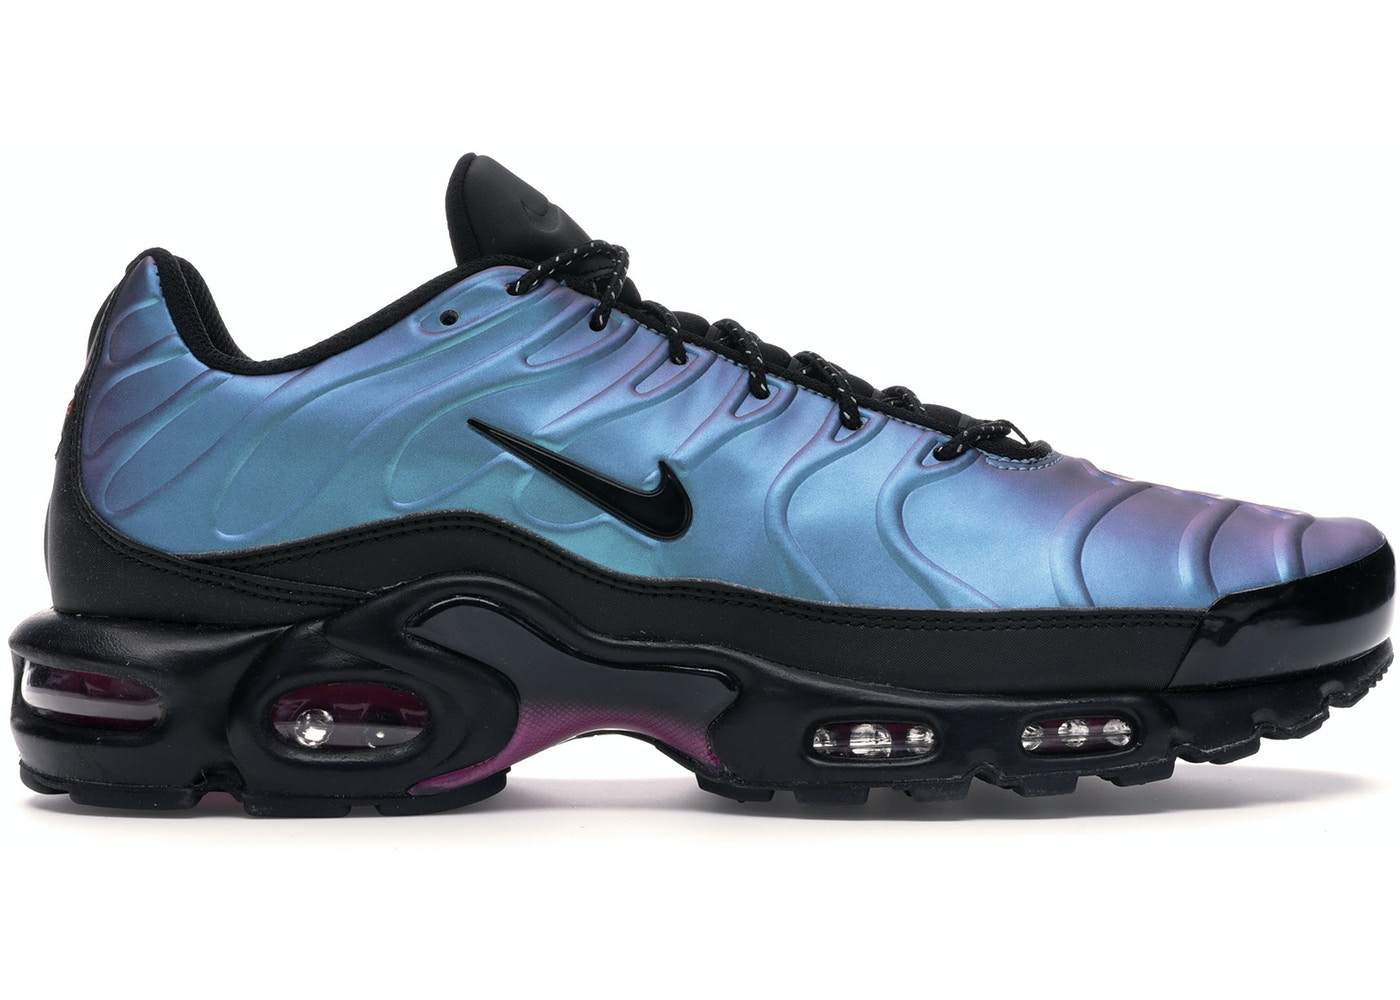 d93df4fdb40 Buy Nike Air Max Plus Shoes & Deadstock Sneakers